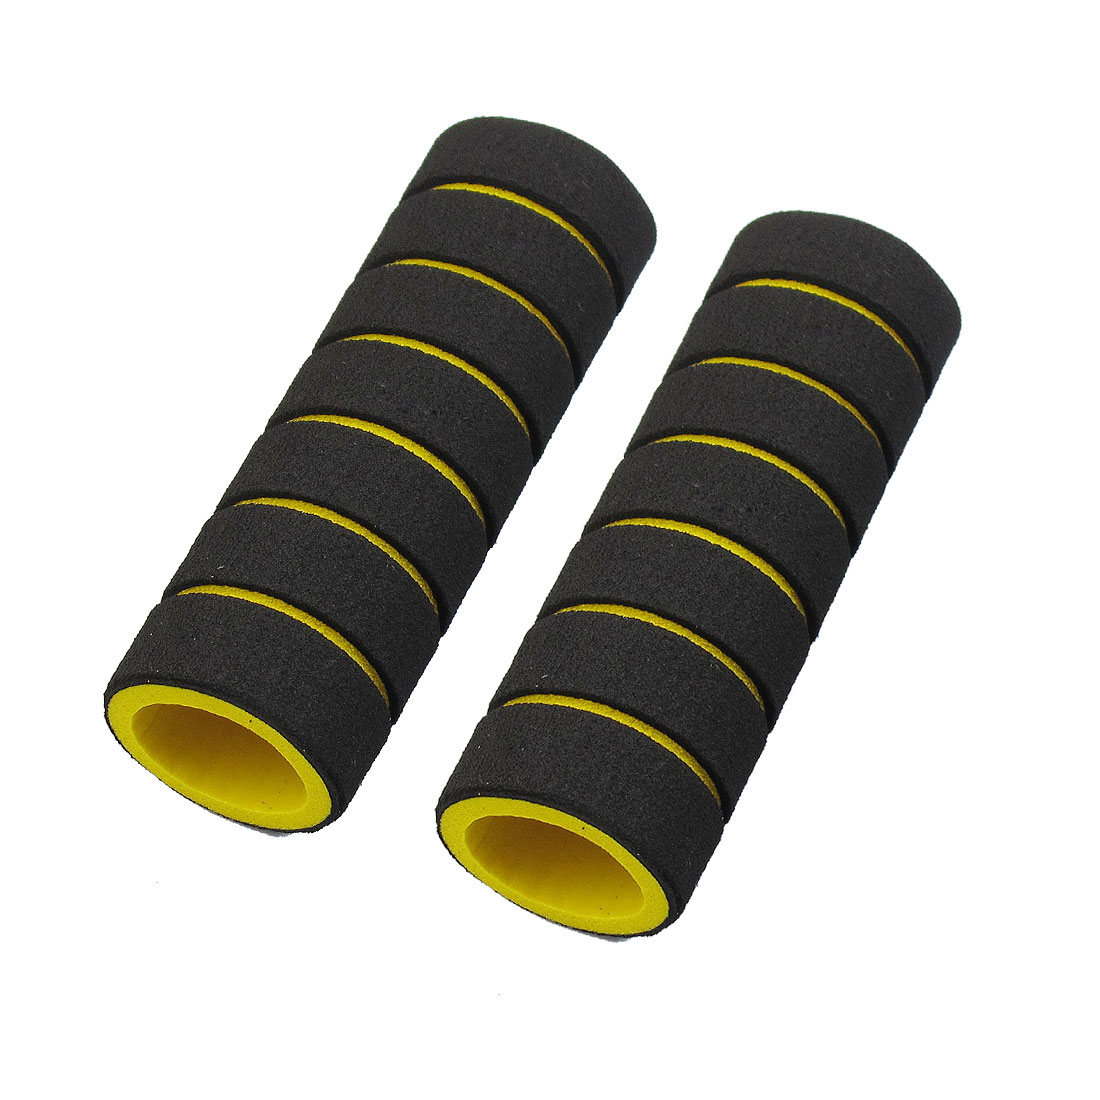 2 Pcs Striped Nonslip Cycling Bike Handlebar Grip Cover Black Yellow